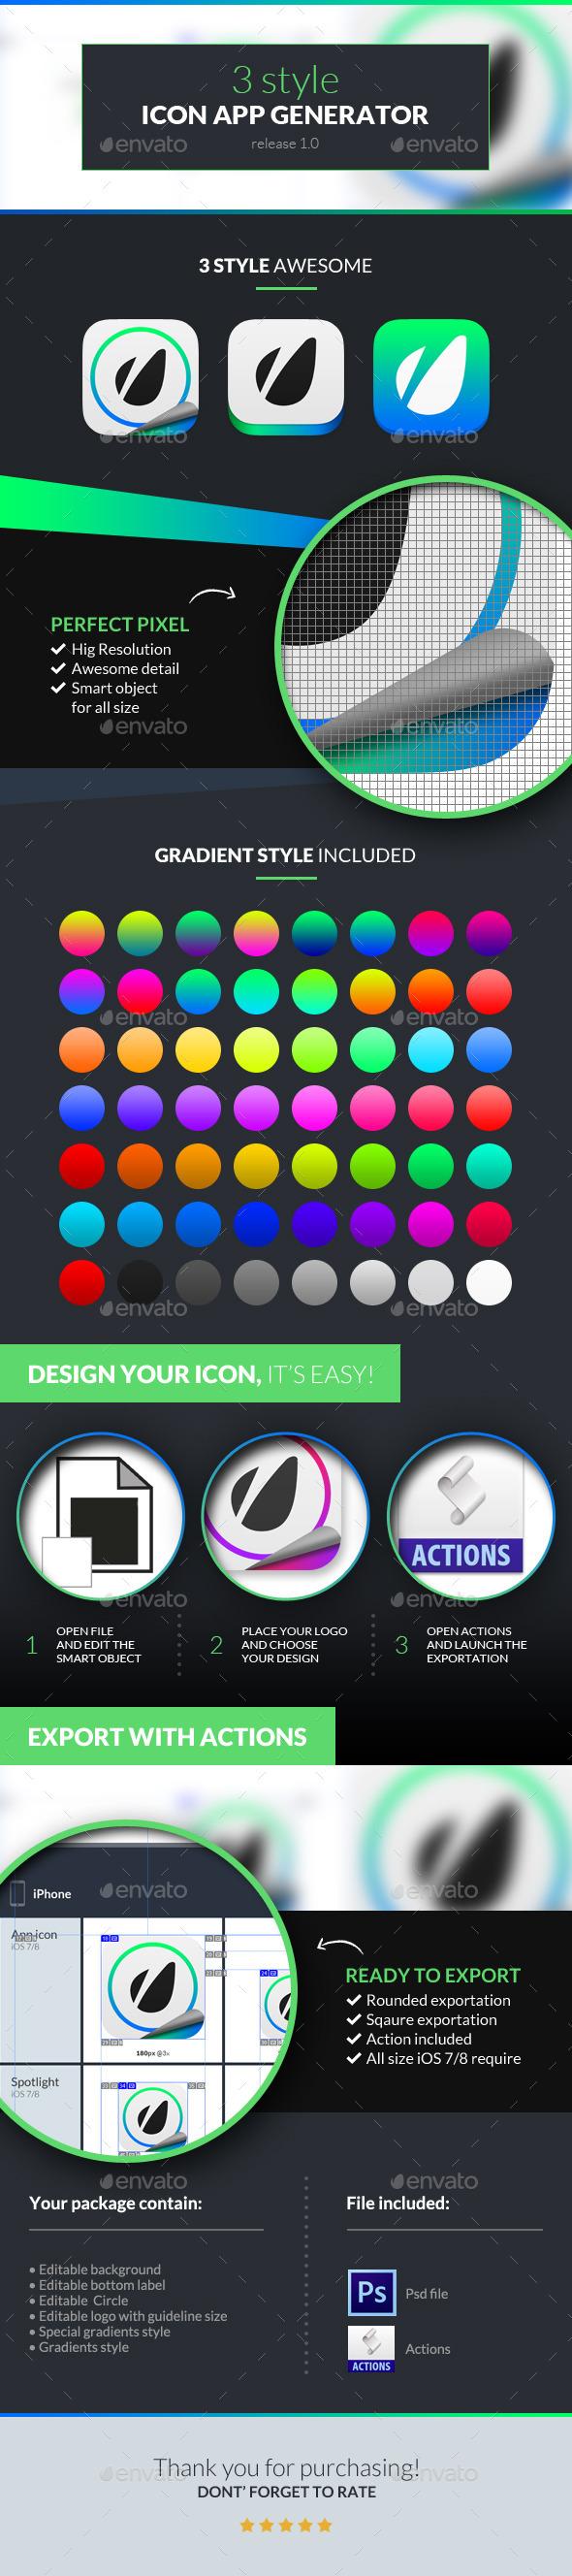 GraphicRiver 3 Style Icon App Generator 10468852